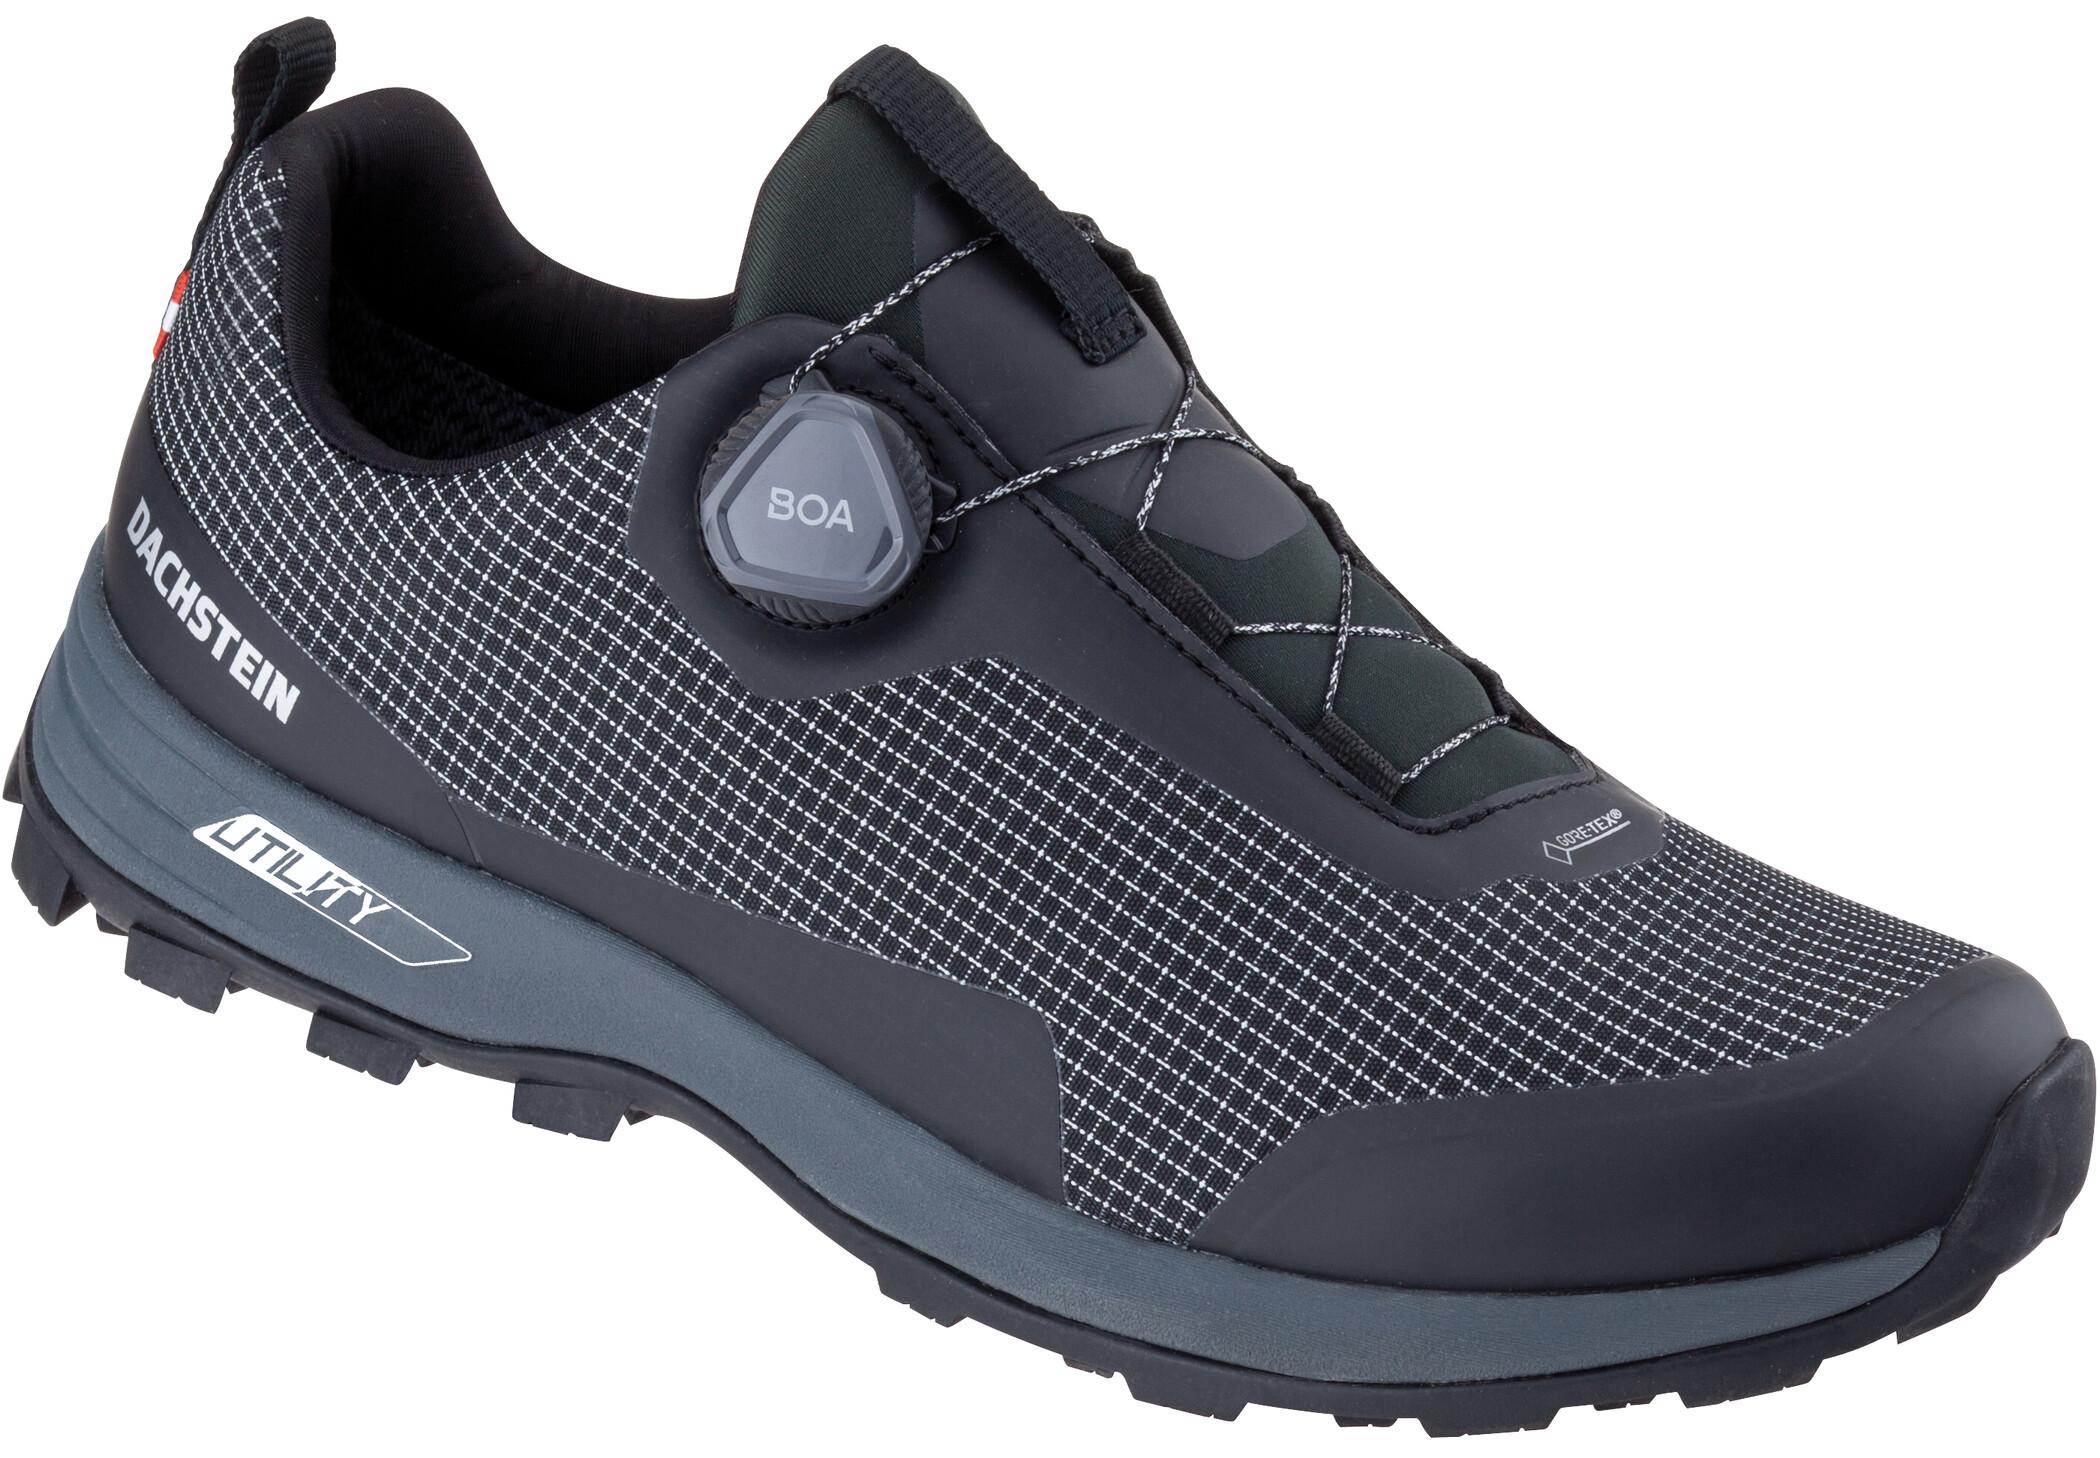 Dachstein Alpha Boa Lc Gtx Trekking Shoes Men Pirate Black Black At Addnature Co Uk